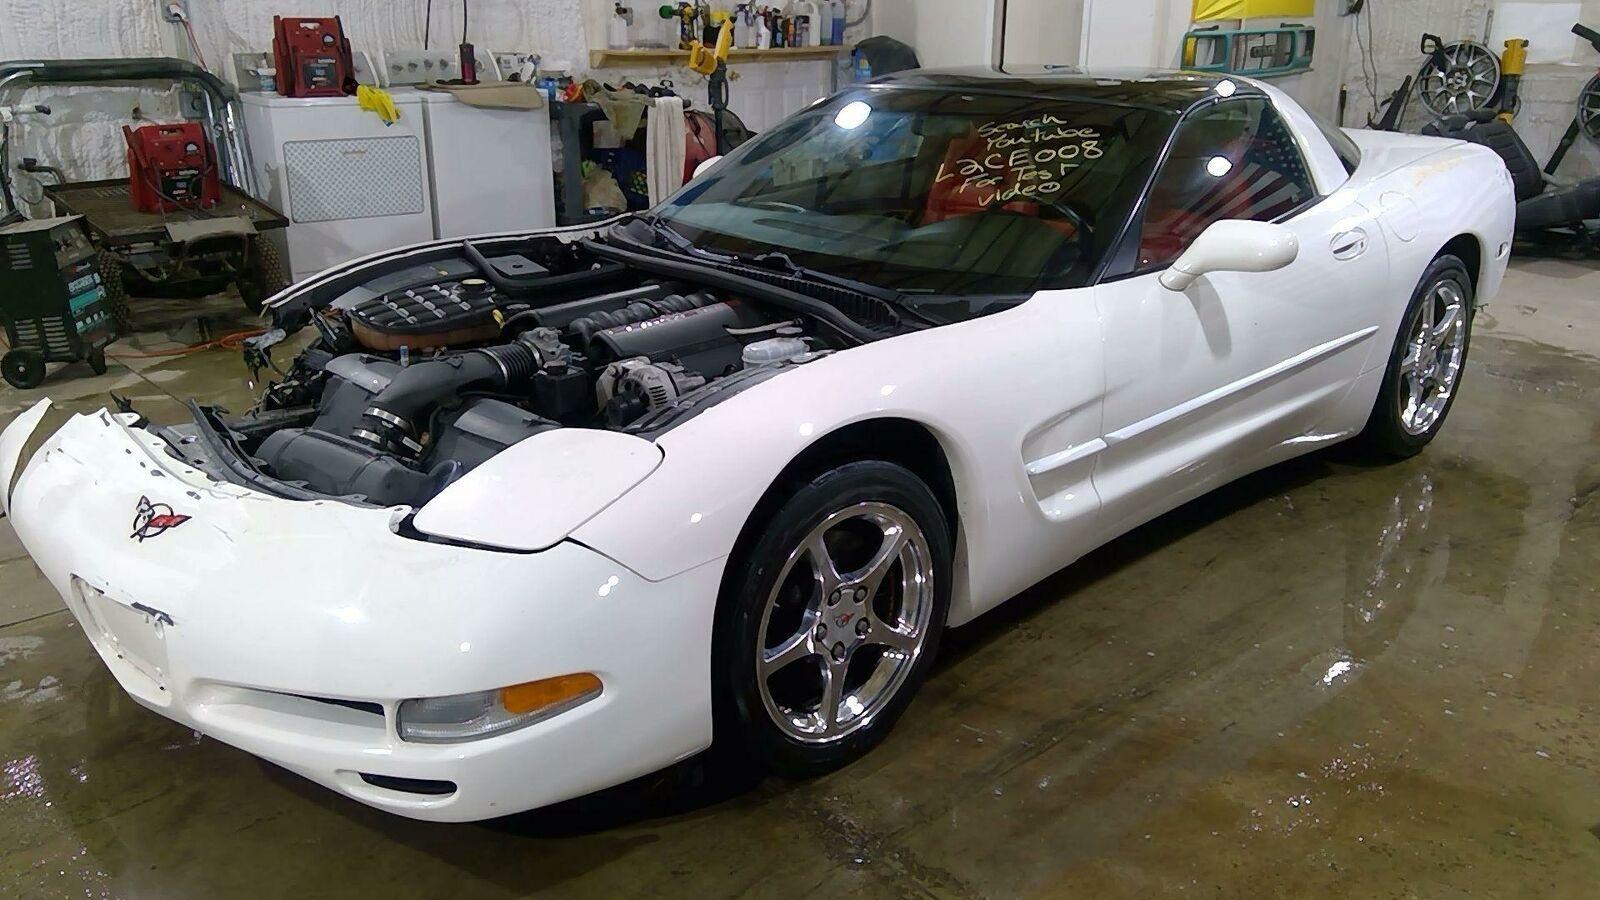 Ls1 Engine in 2020 Ls1 engine, Engineering, 2003 corvette